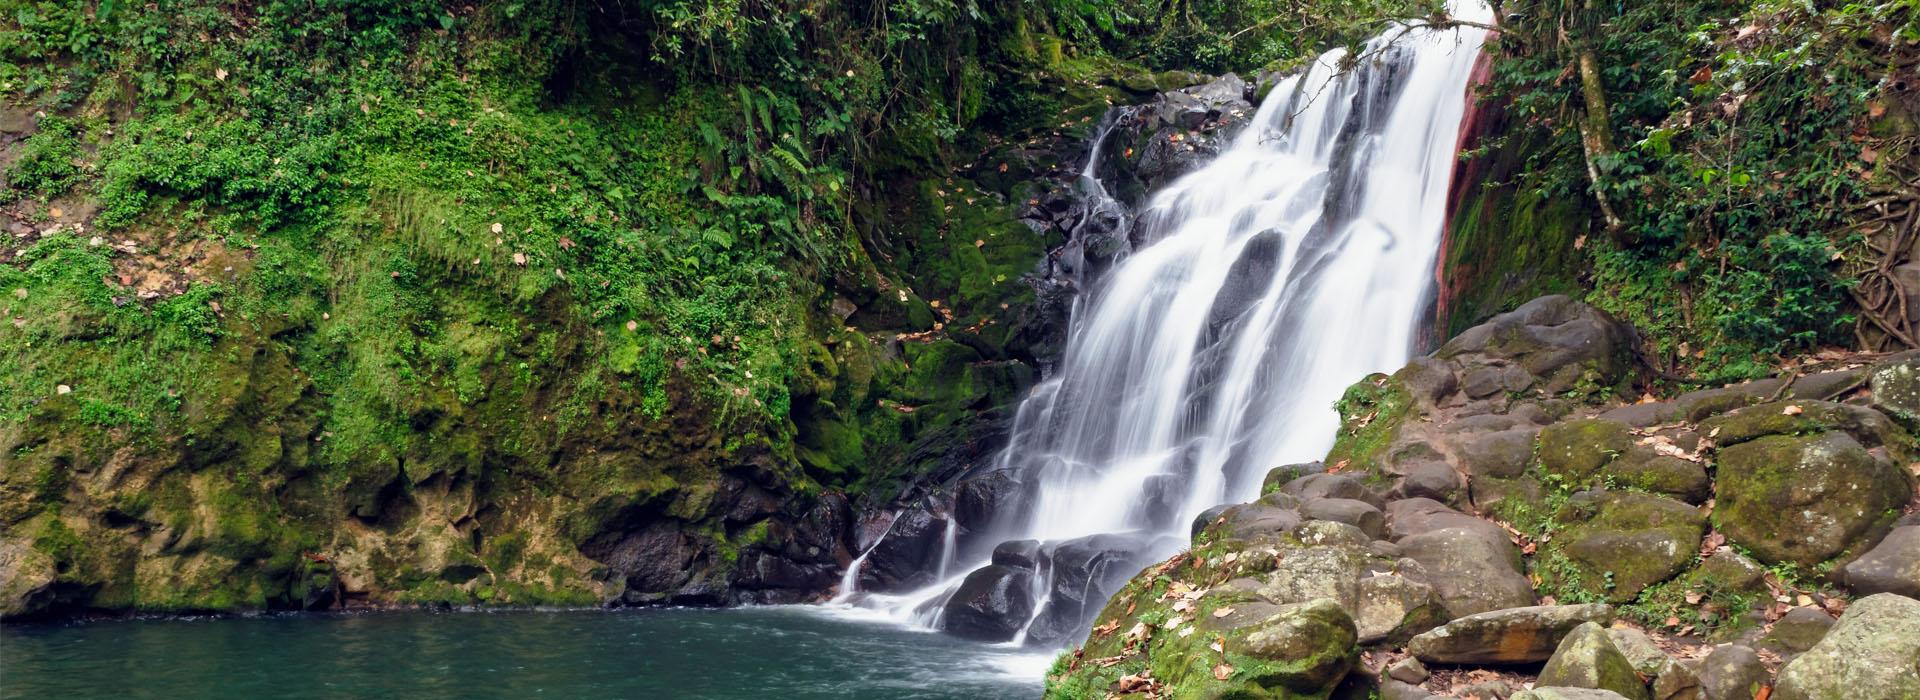 Murchison Waterfall - Top Destinations African Adventure specialists